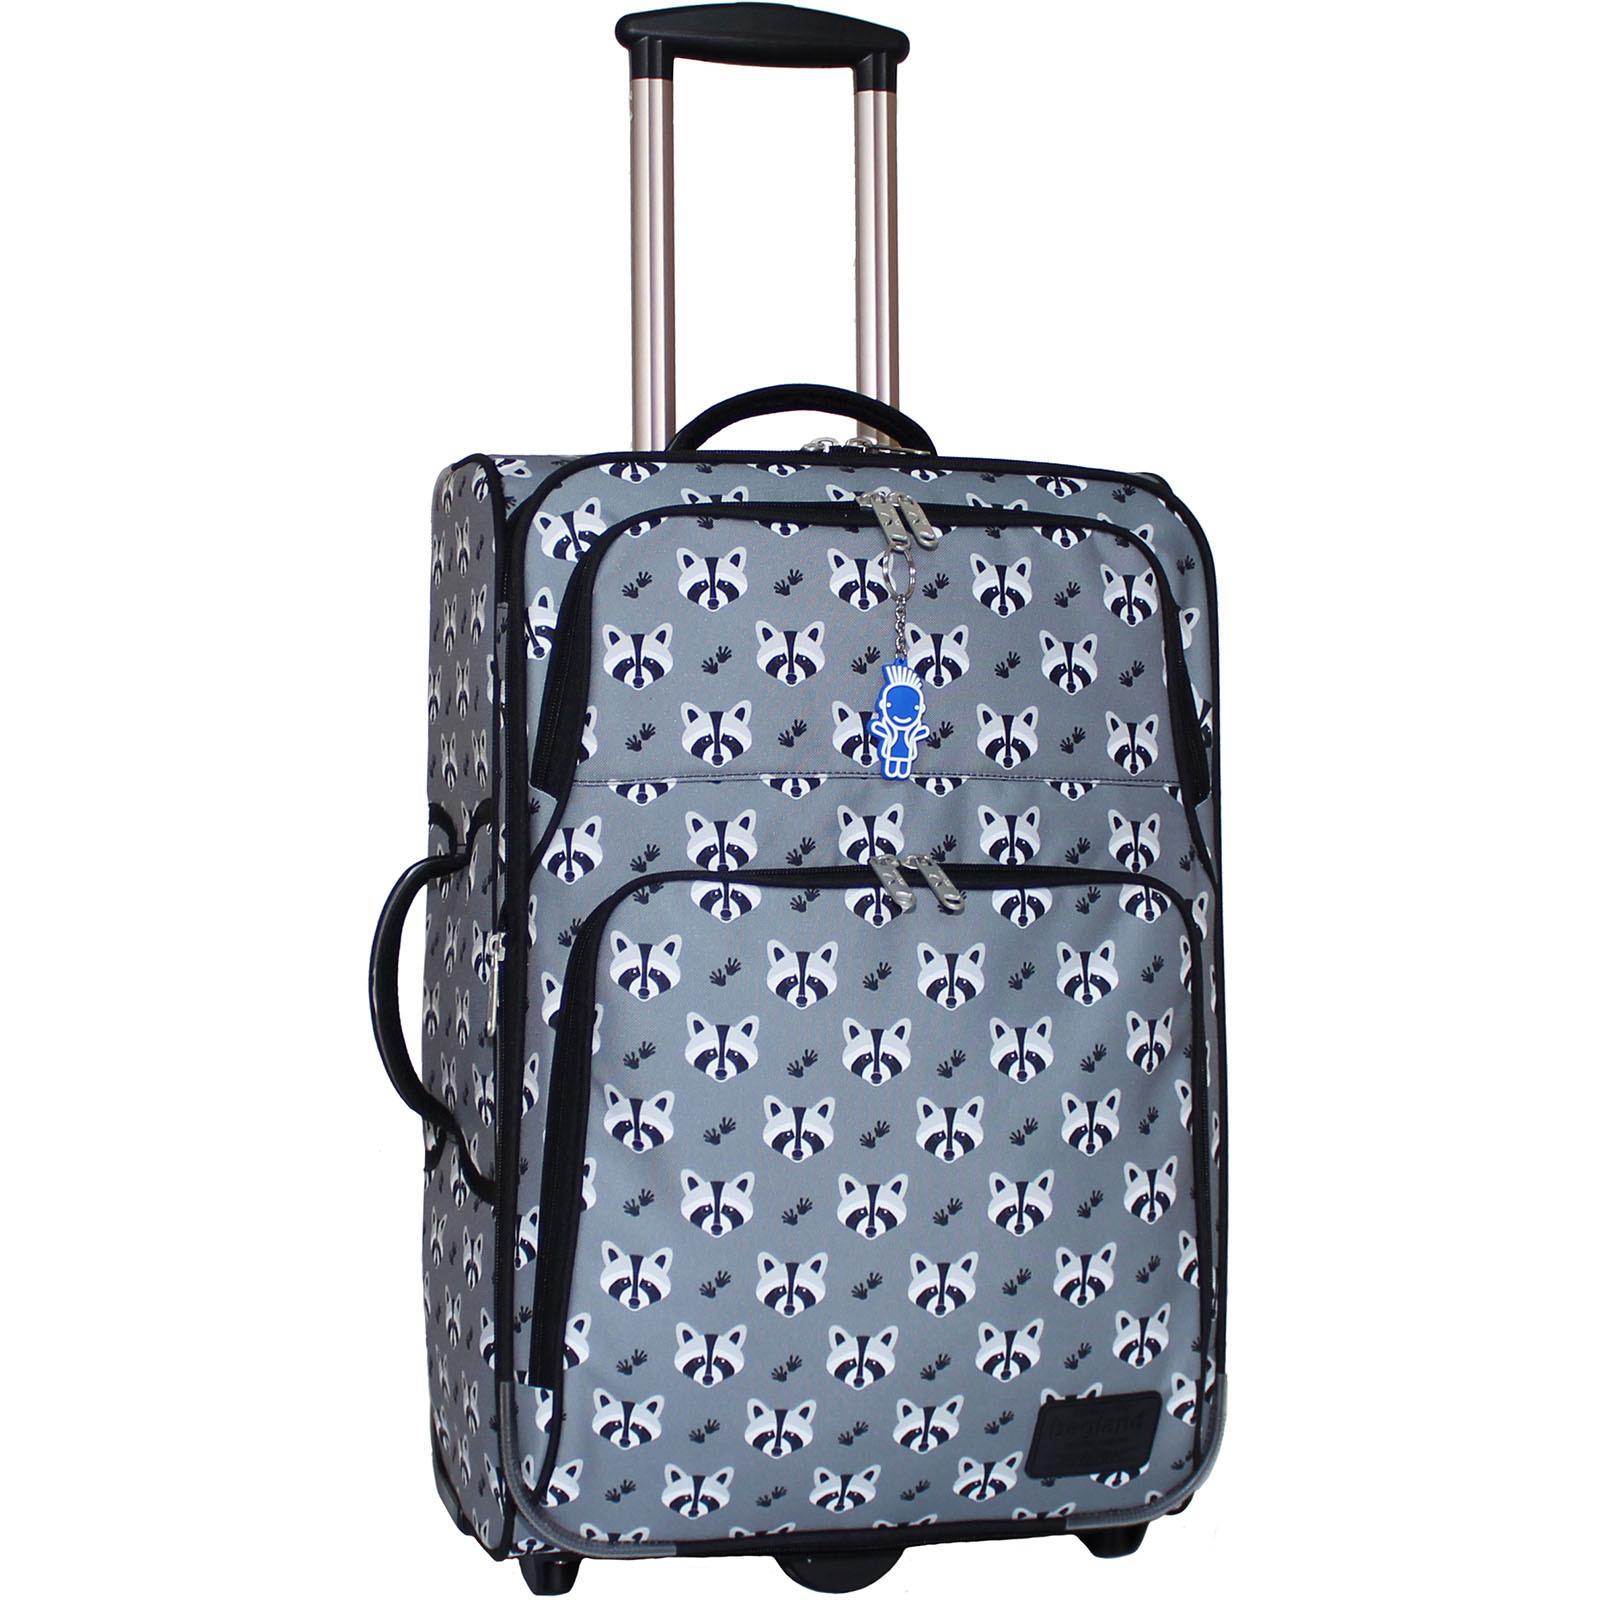 Дорожные чемоданы Чемодан Bagland Леон средний дизайн 51 л. сублімація 353 (0037666244) IMG_7833.JPG